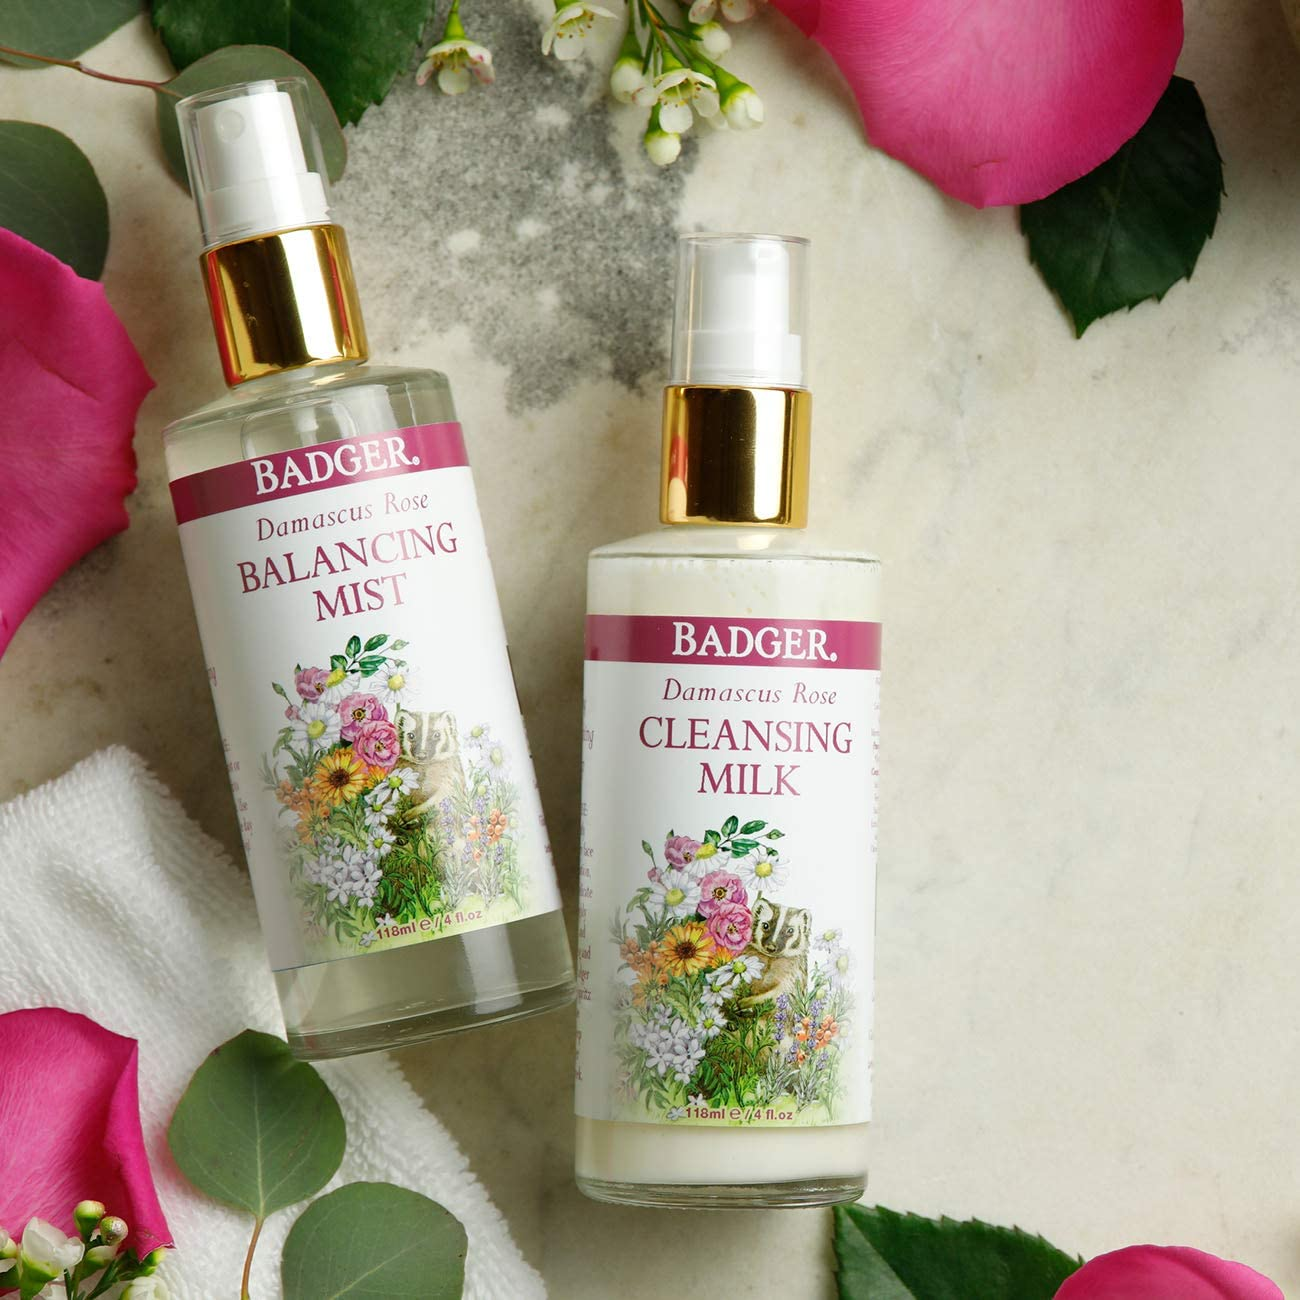 Badger – Damasco Rose Cleansing Leche, botella de 4 oz